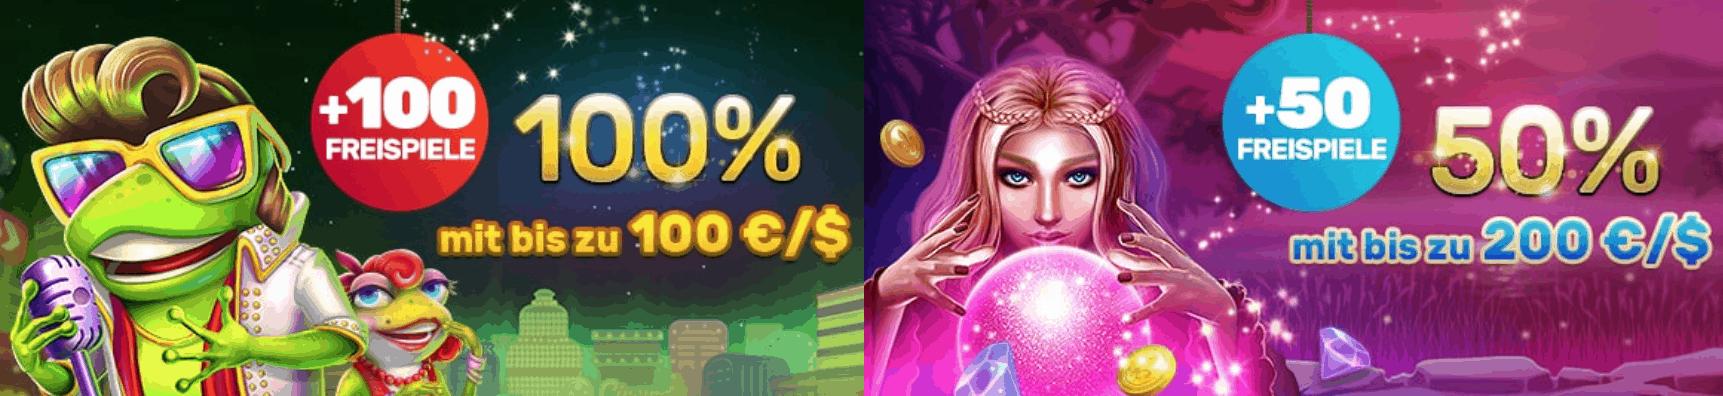 Playamo Bonus Code